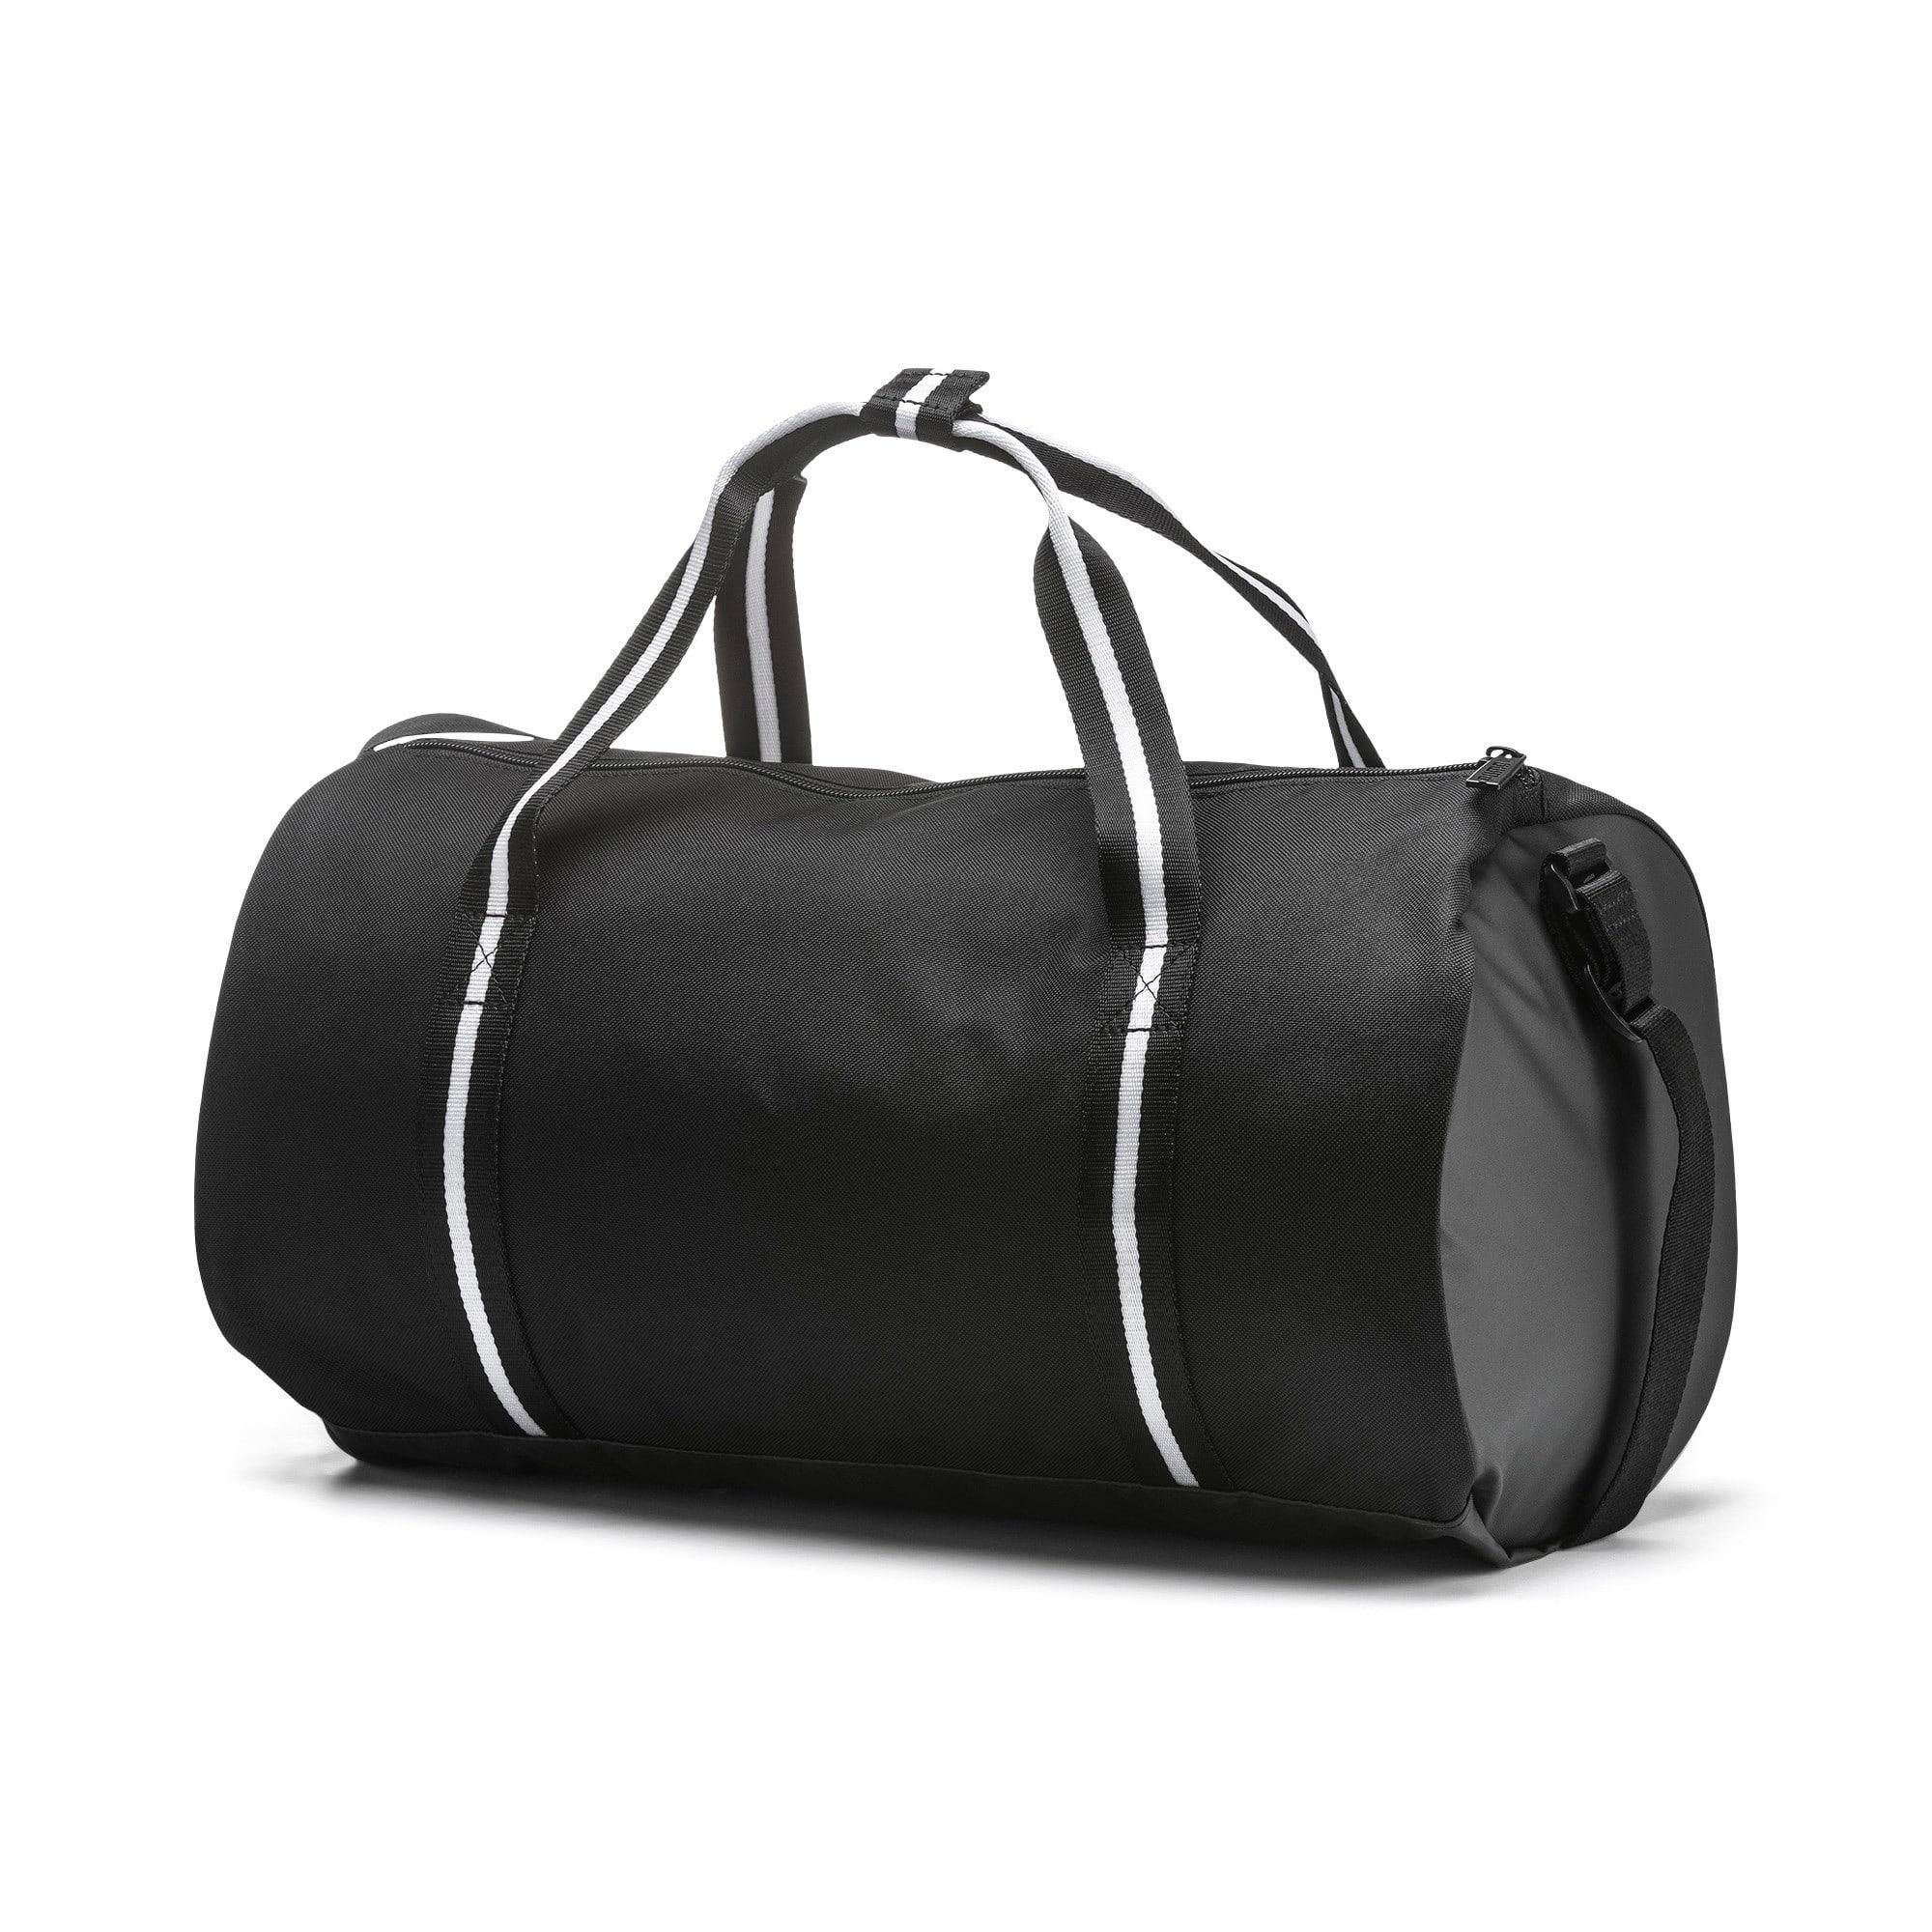 Thumbnail 3 of Base Women's Barrel Bag, Puma Black, medium-IND